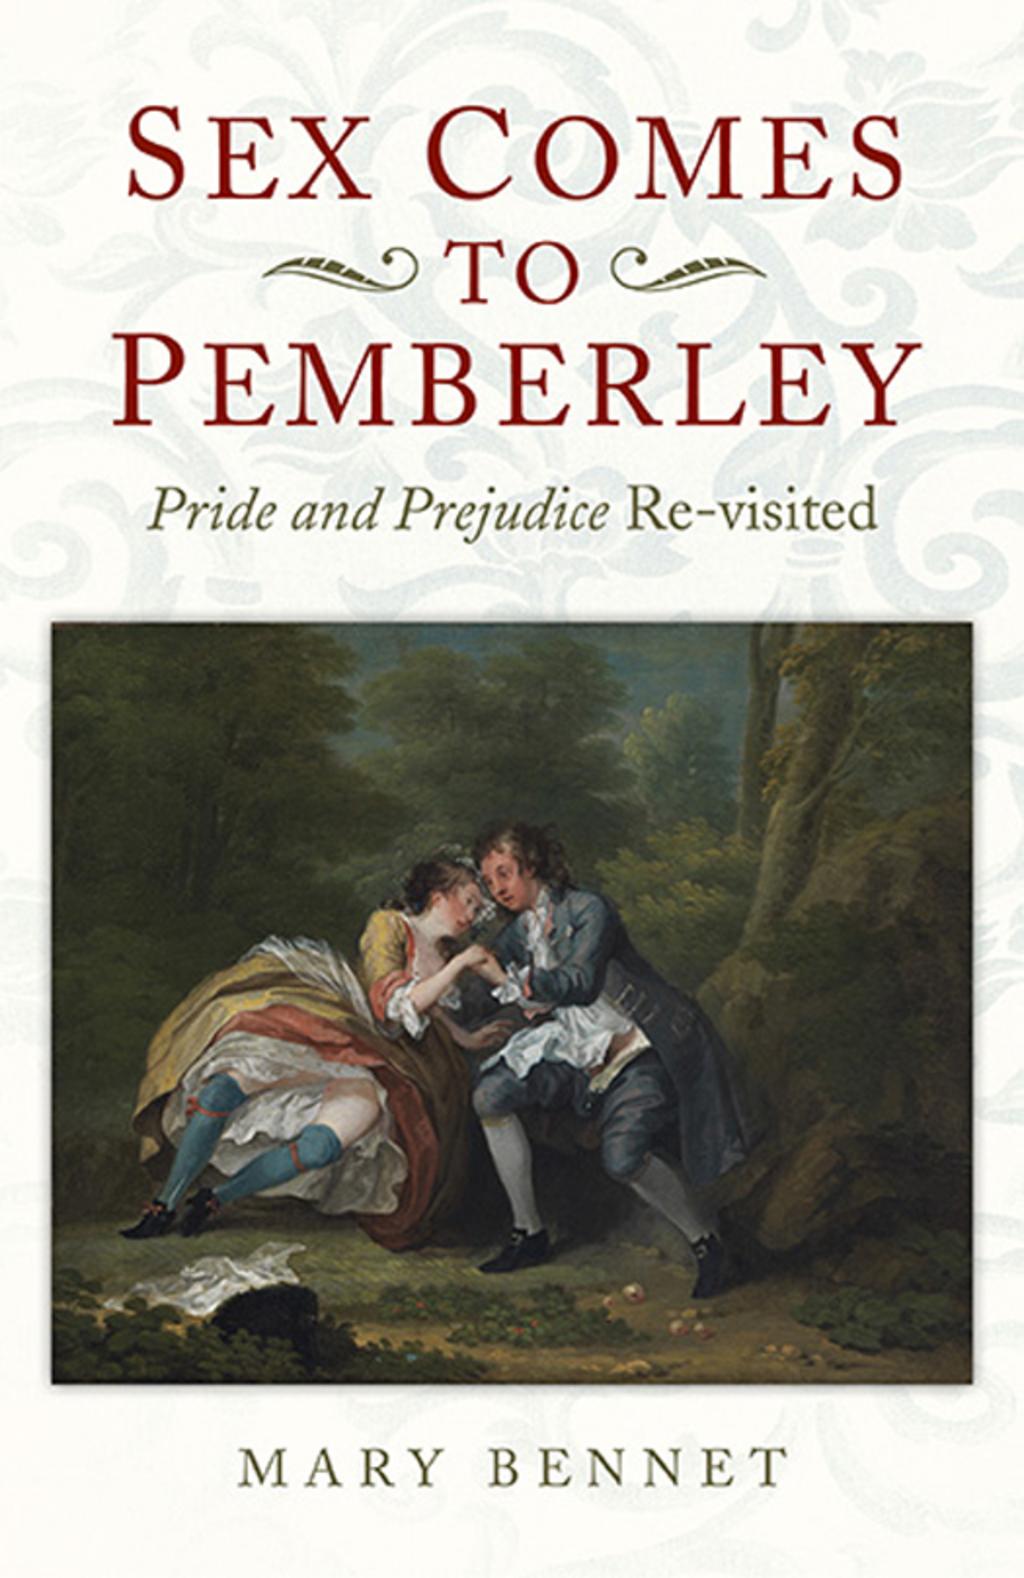 Sex Comes to Pemberley: 'Pride and Prejudice' Re-visited (eBook)